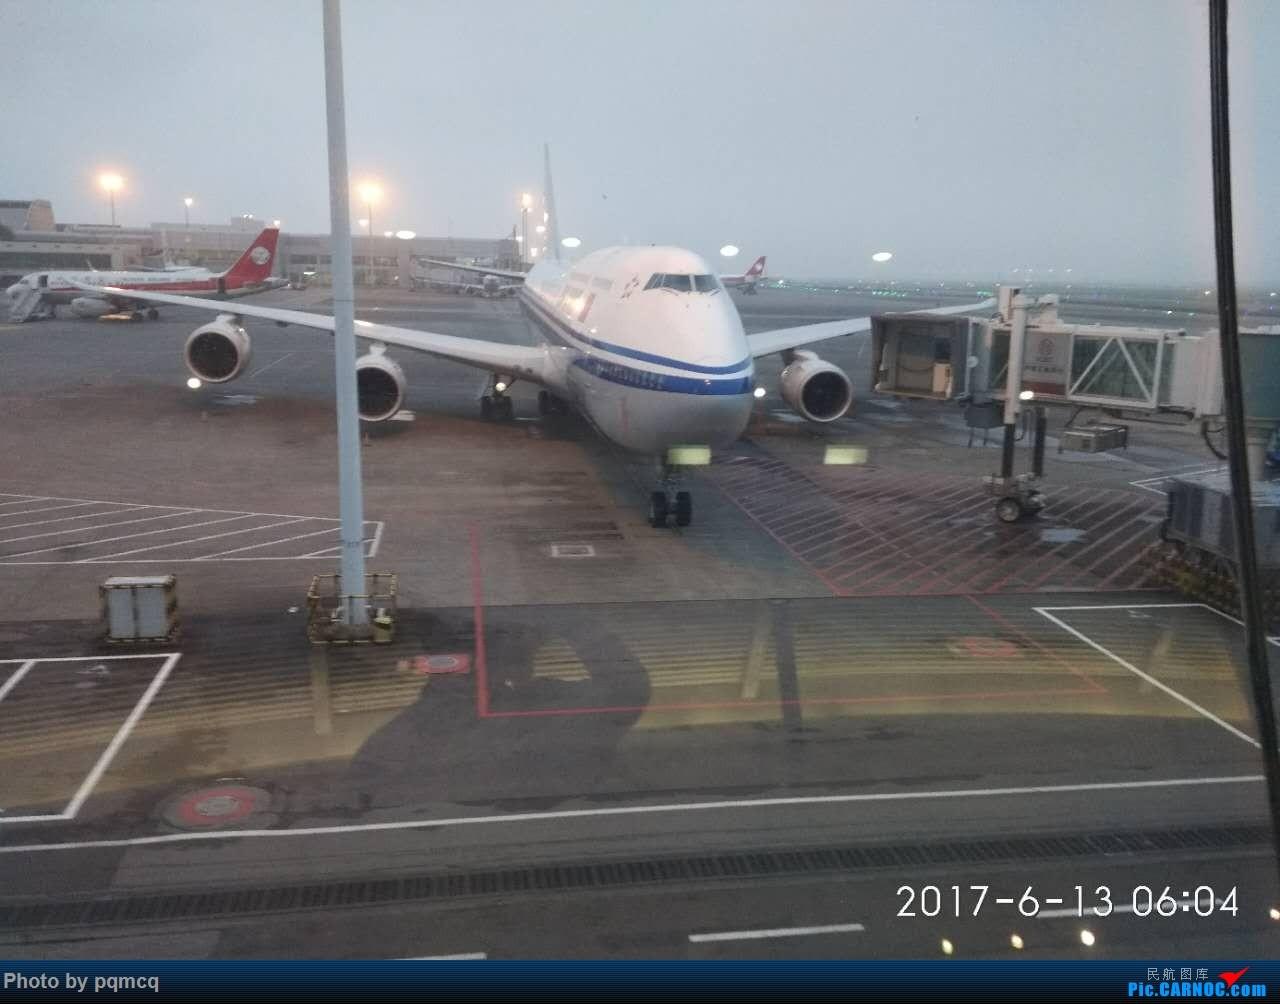 Re:6月13日CKG-PEK CA4144航班 BOEING 747-800  重庆机场